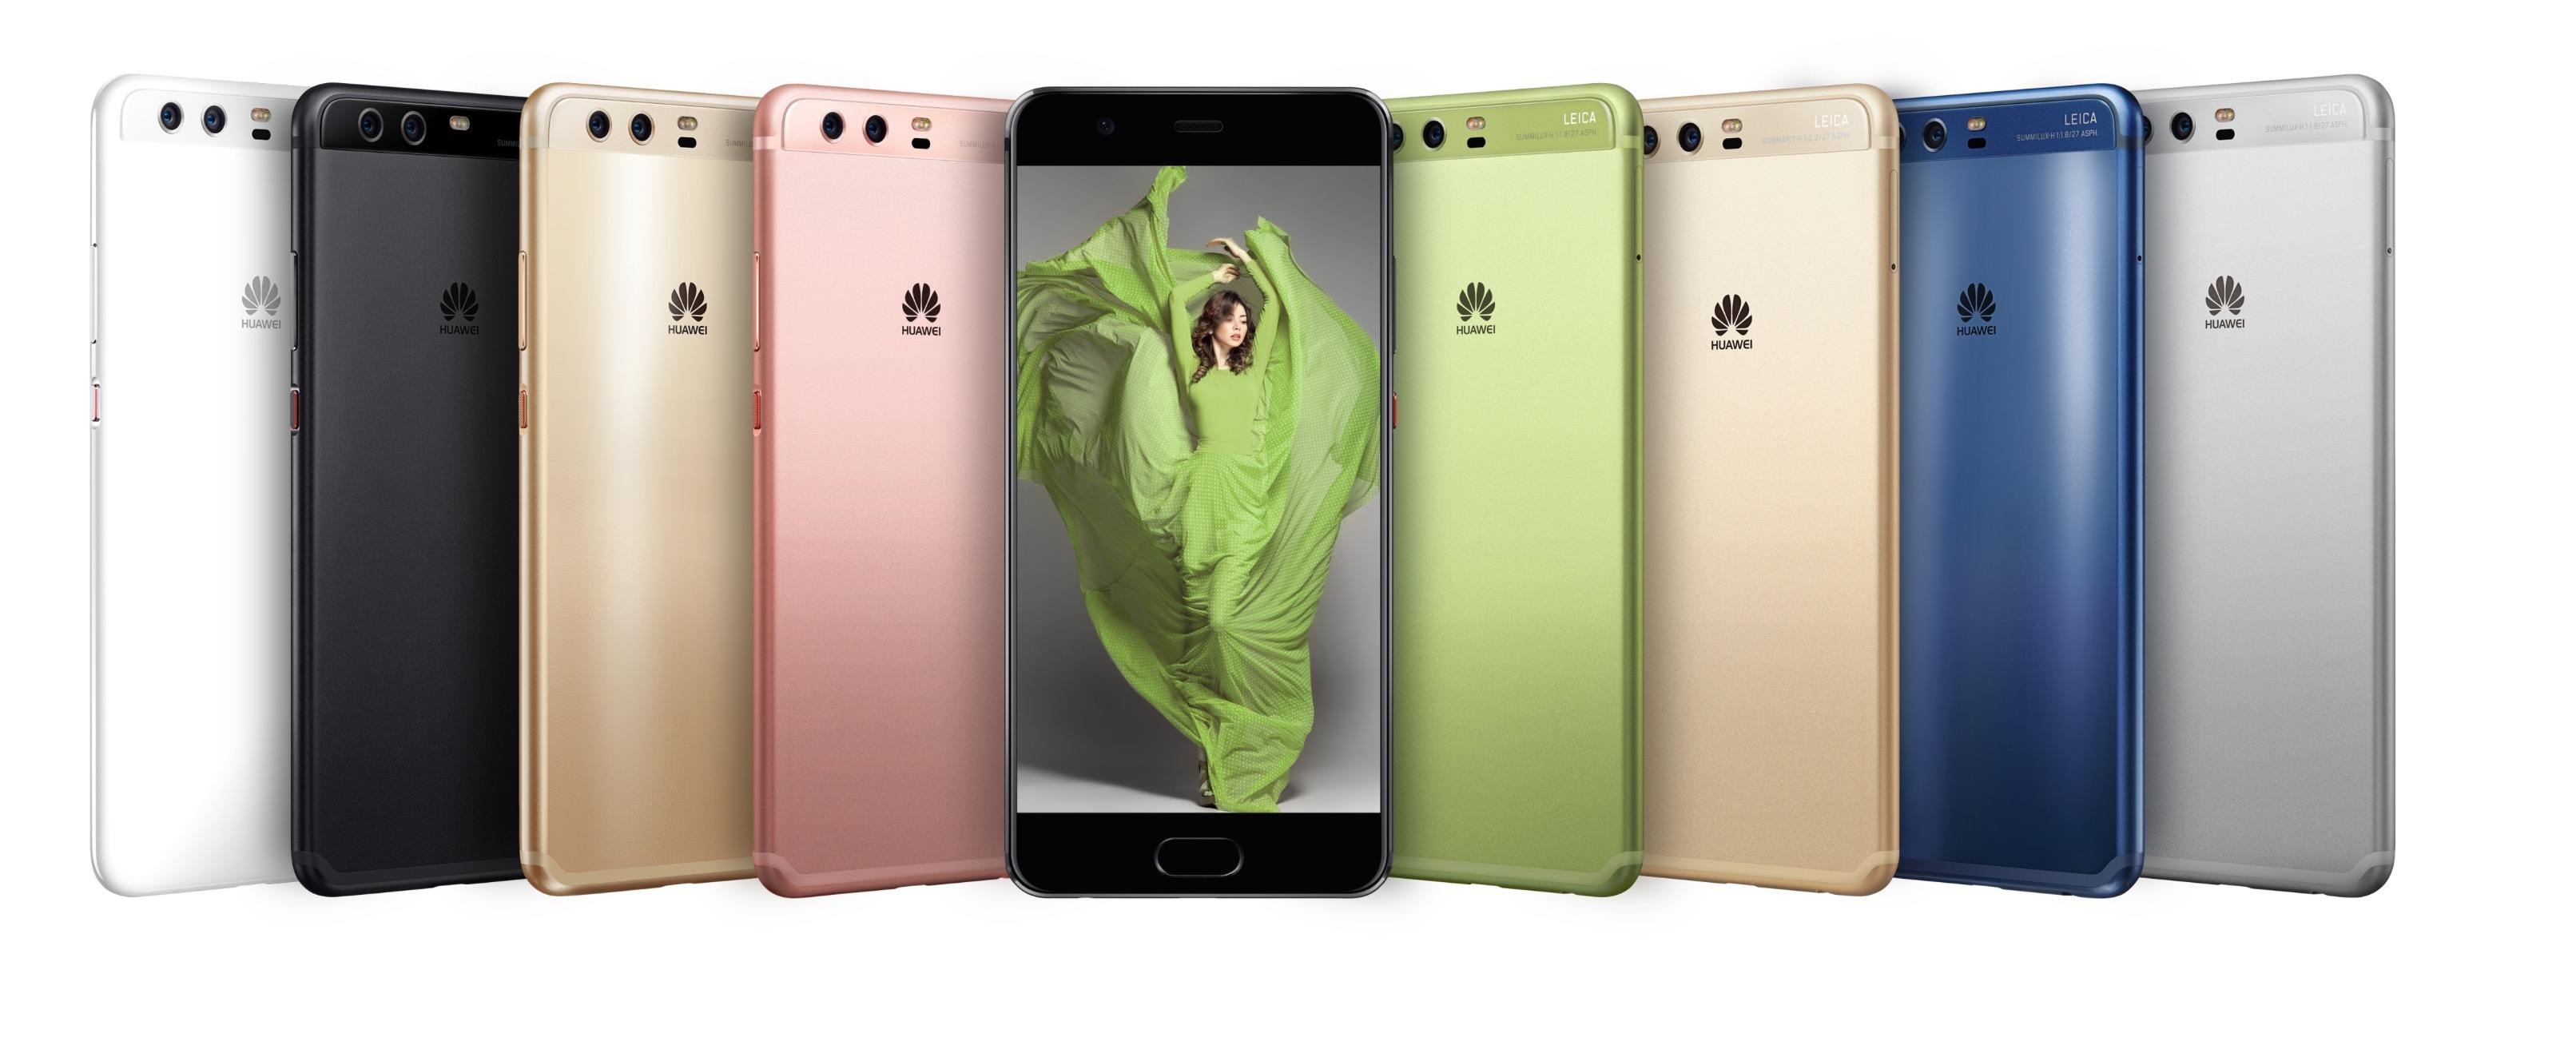 Huawei P10 colorazioni